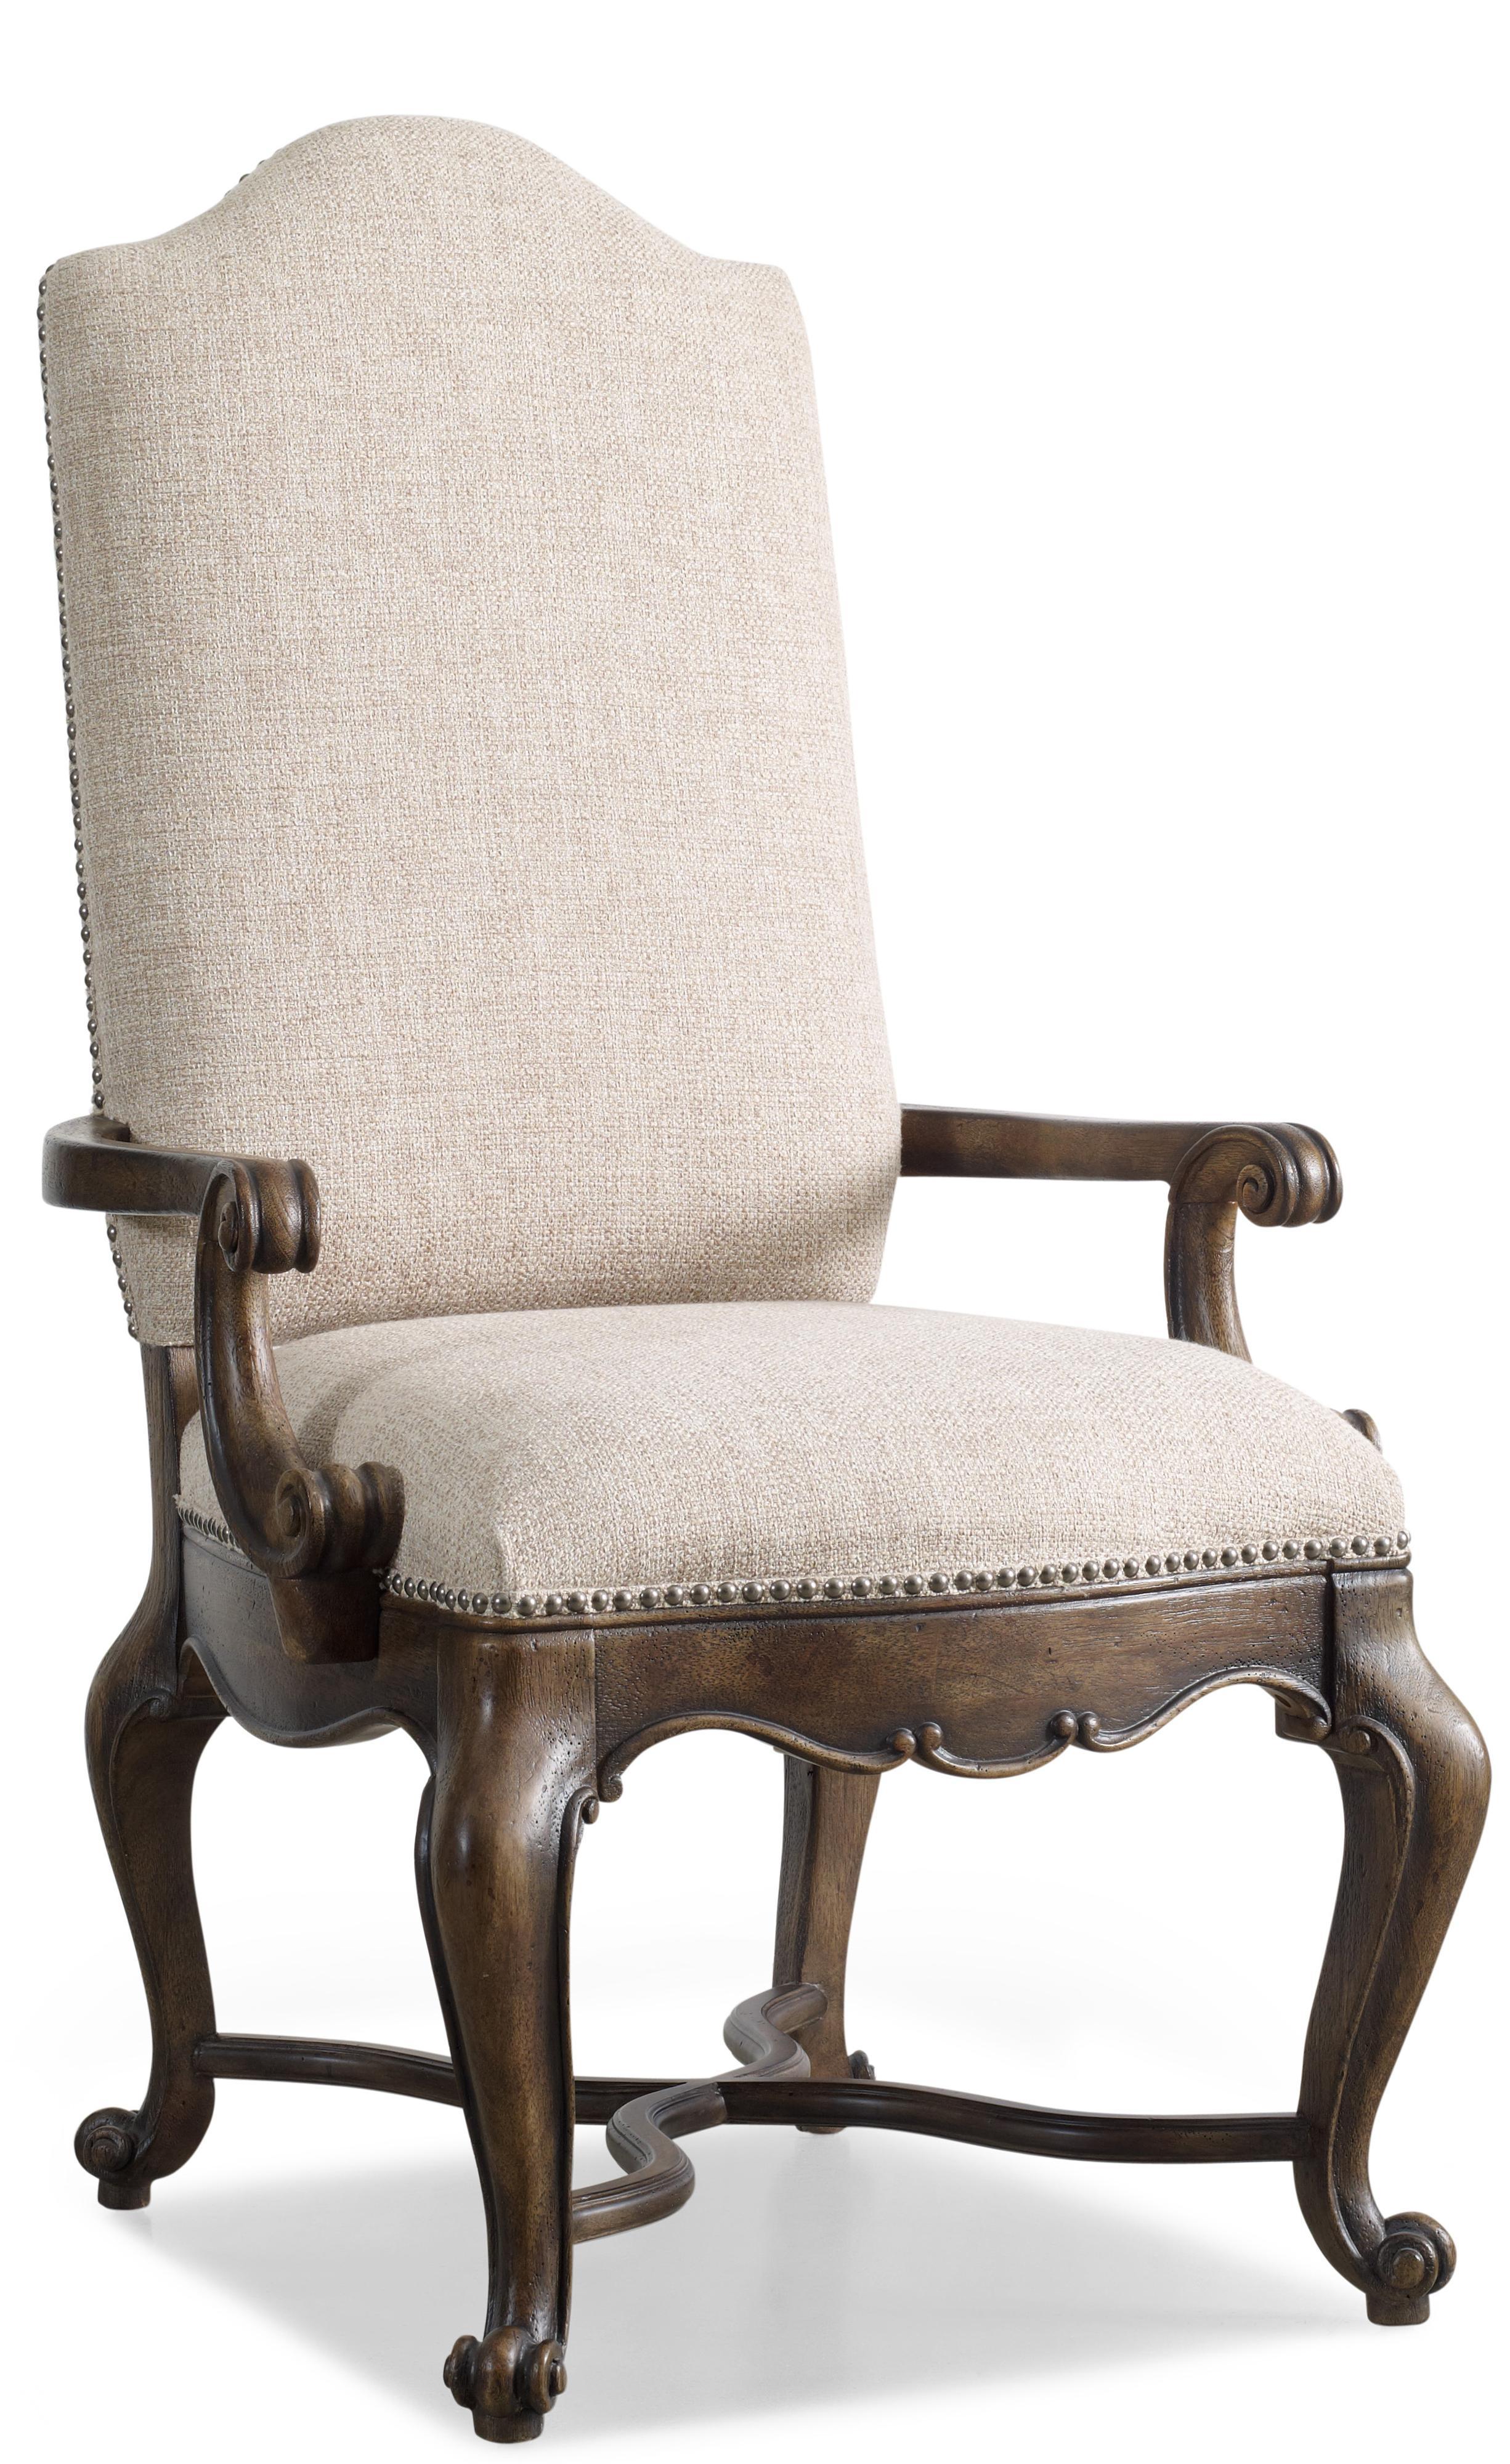 Hooker furniture rhapsody upholstered dining arm chair for Upholstered dining chairs with arms